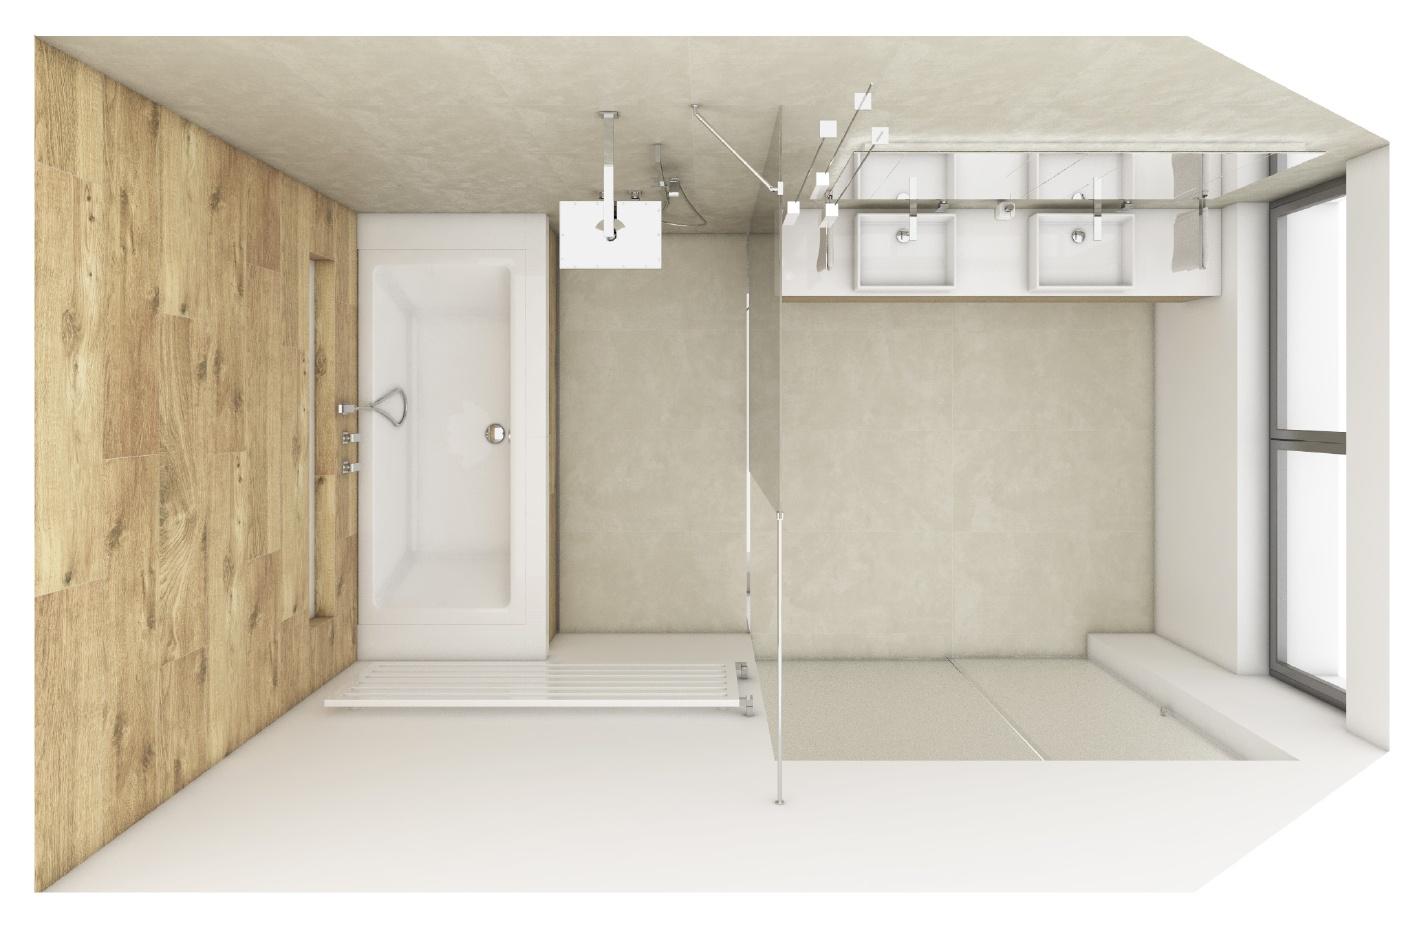 Moderne Badezimmer Grundrisse ? Bitmoon.info Badezimmer Grundriss